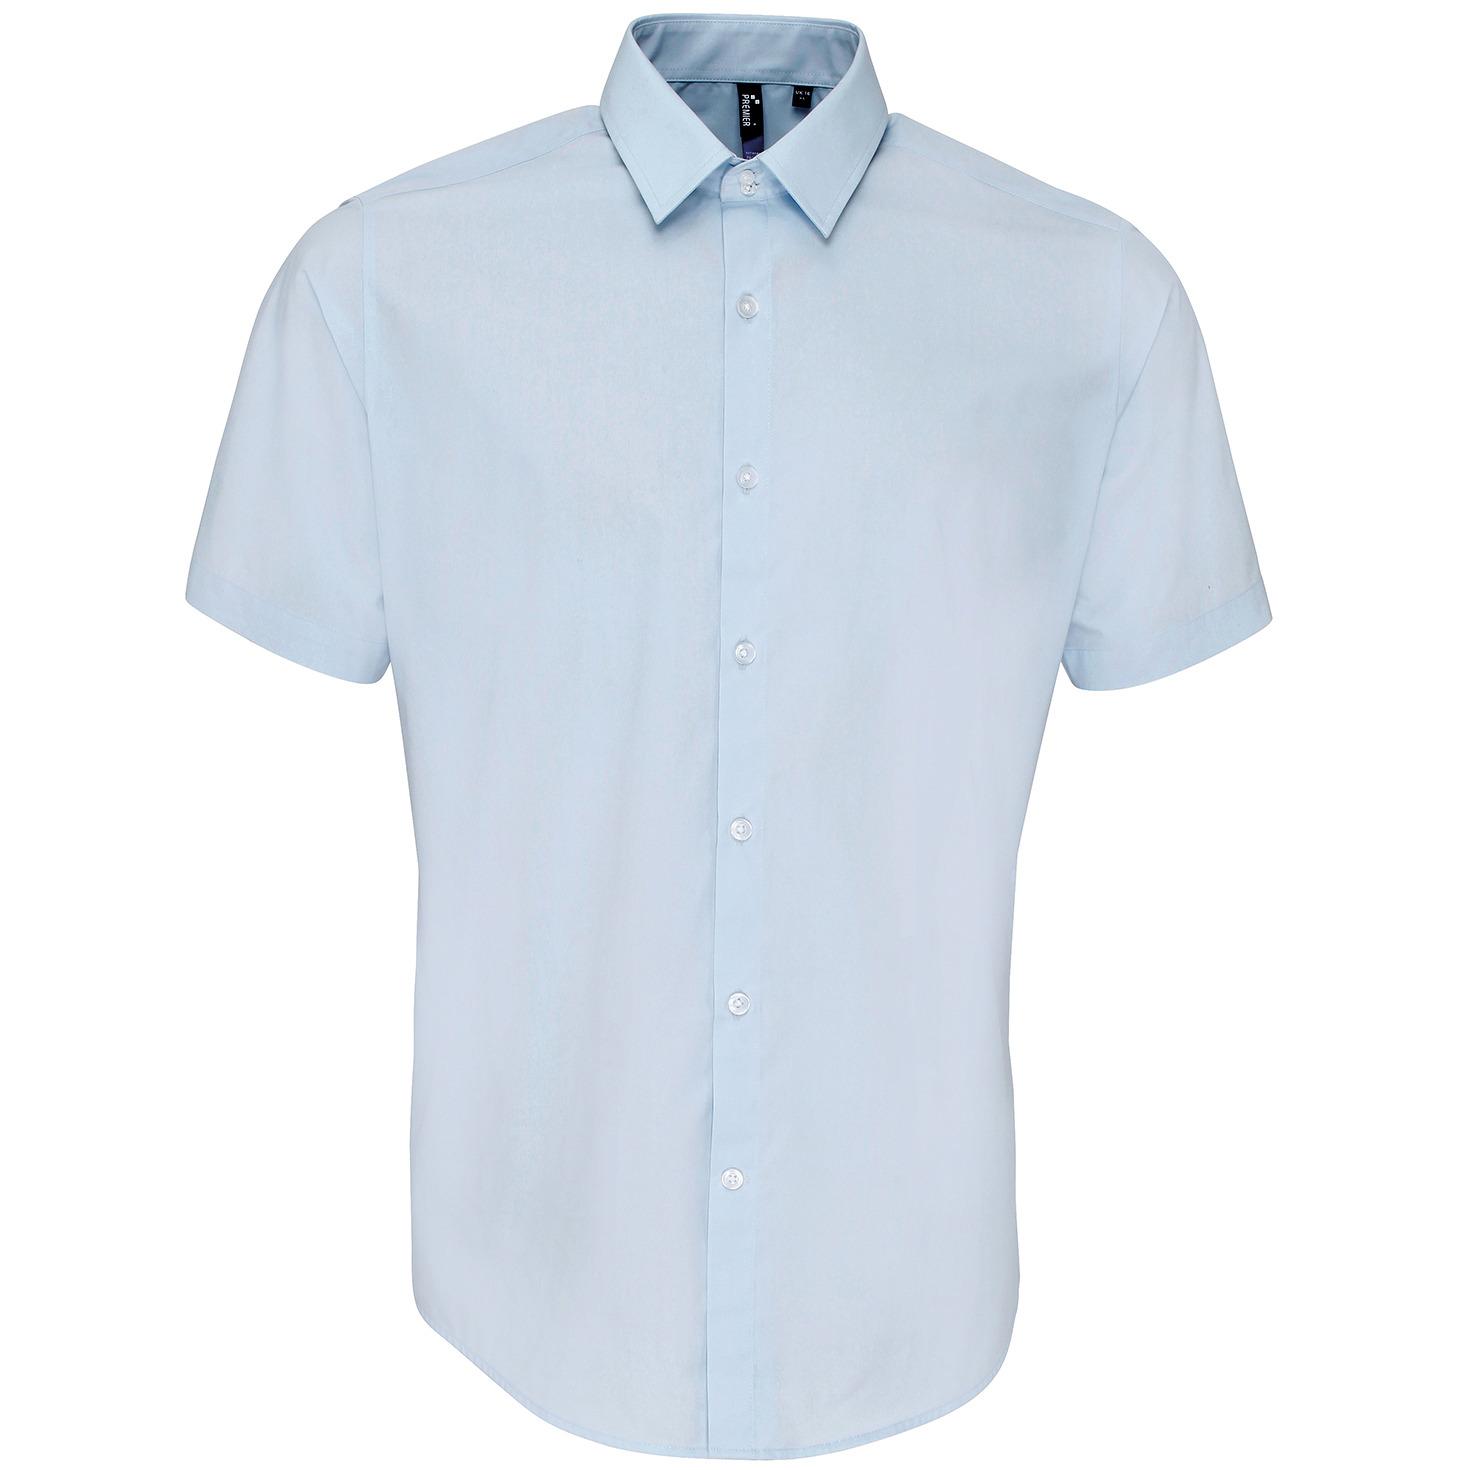 13df40745d7 Supreme Men s Poplin Short Sleeve Shirt - Dahan